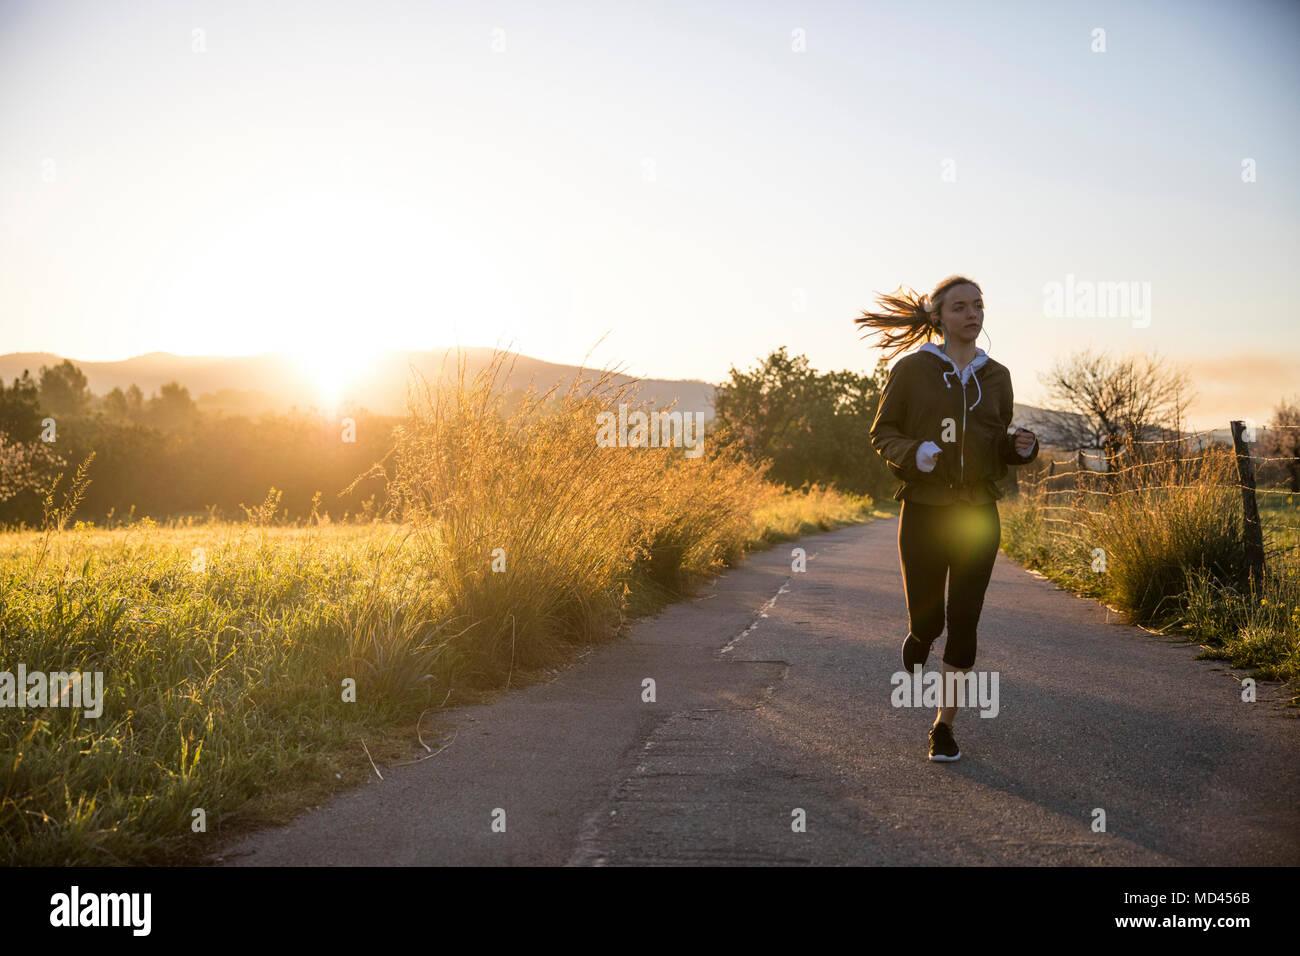 Young woman running along rural road - Stock Image